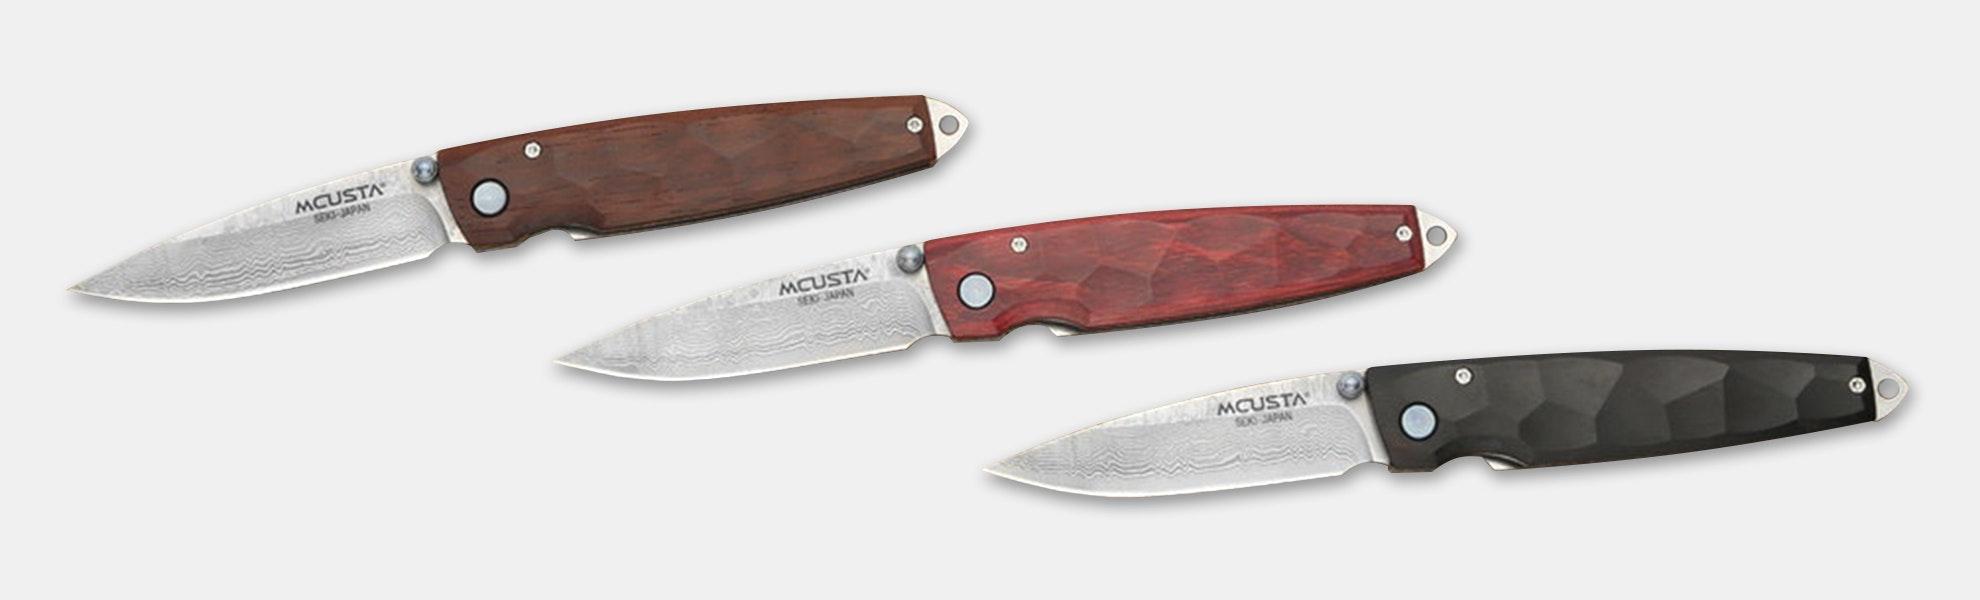 Mcusta MC-7 Tsuchi VG-10 Damascus Folding Knife